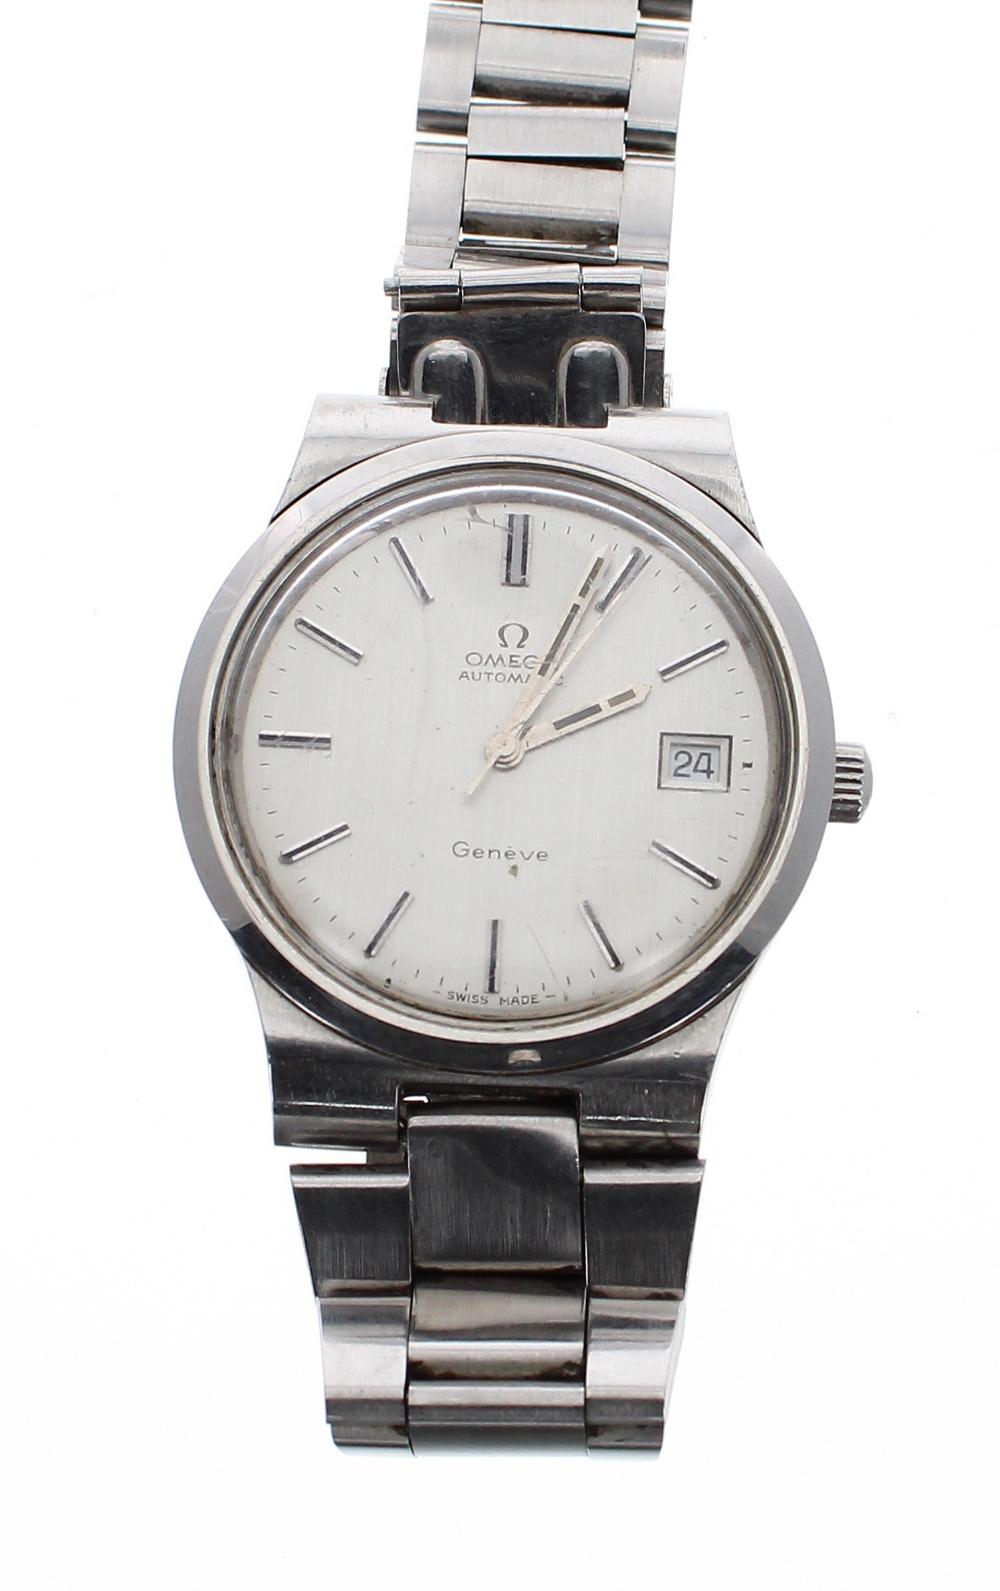 Lot 11 - Omega Genéve automatic stainless steel gentleman's bracelet watch, ref. 166 0173 / 366 0832, circa